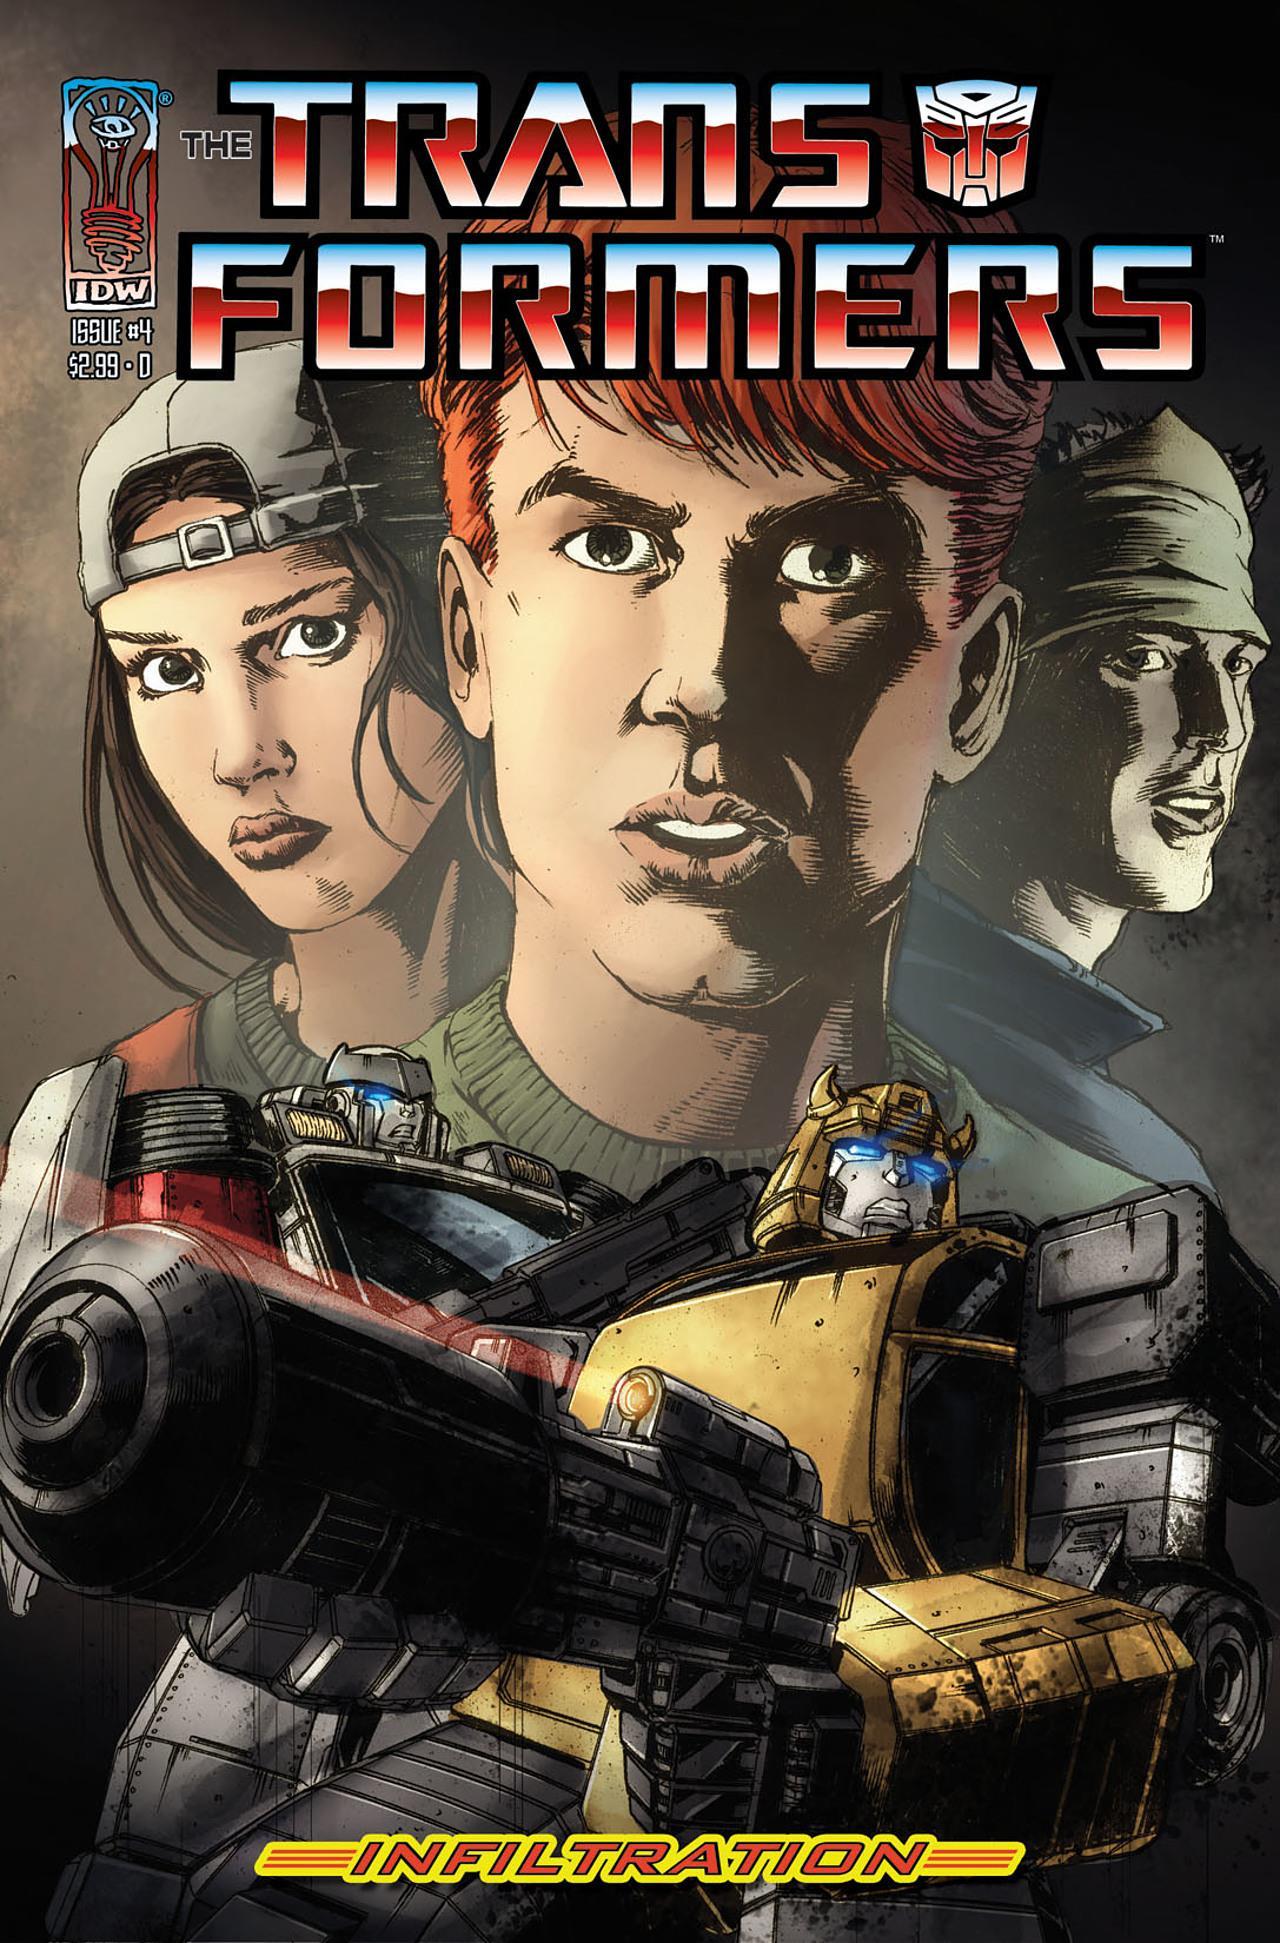 Cover D: James Raiz